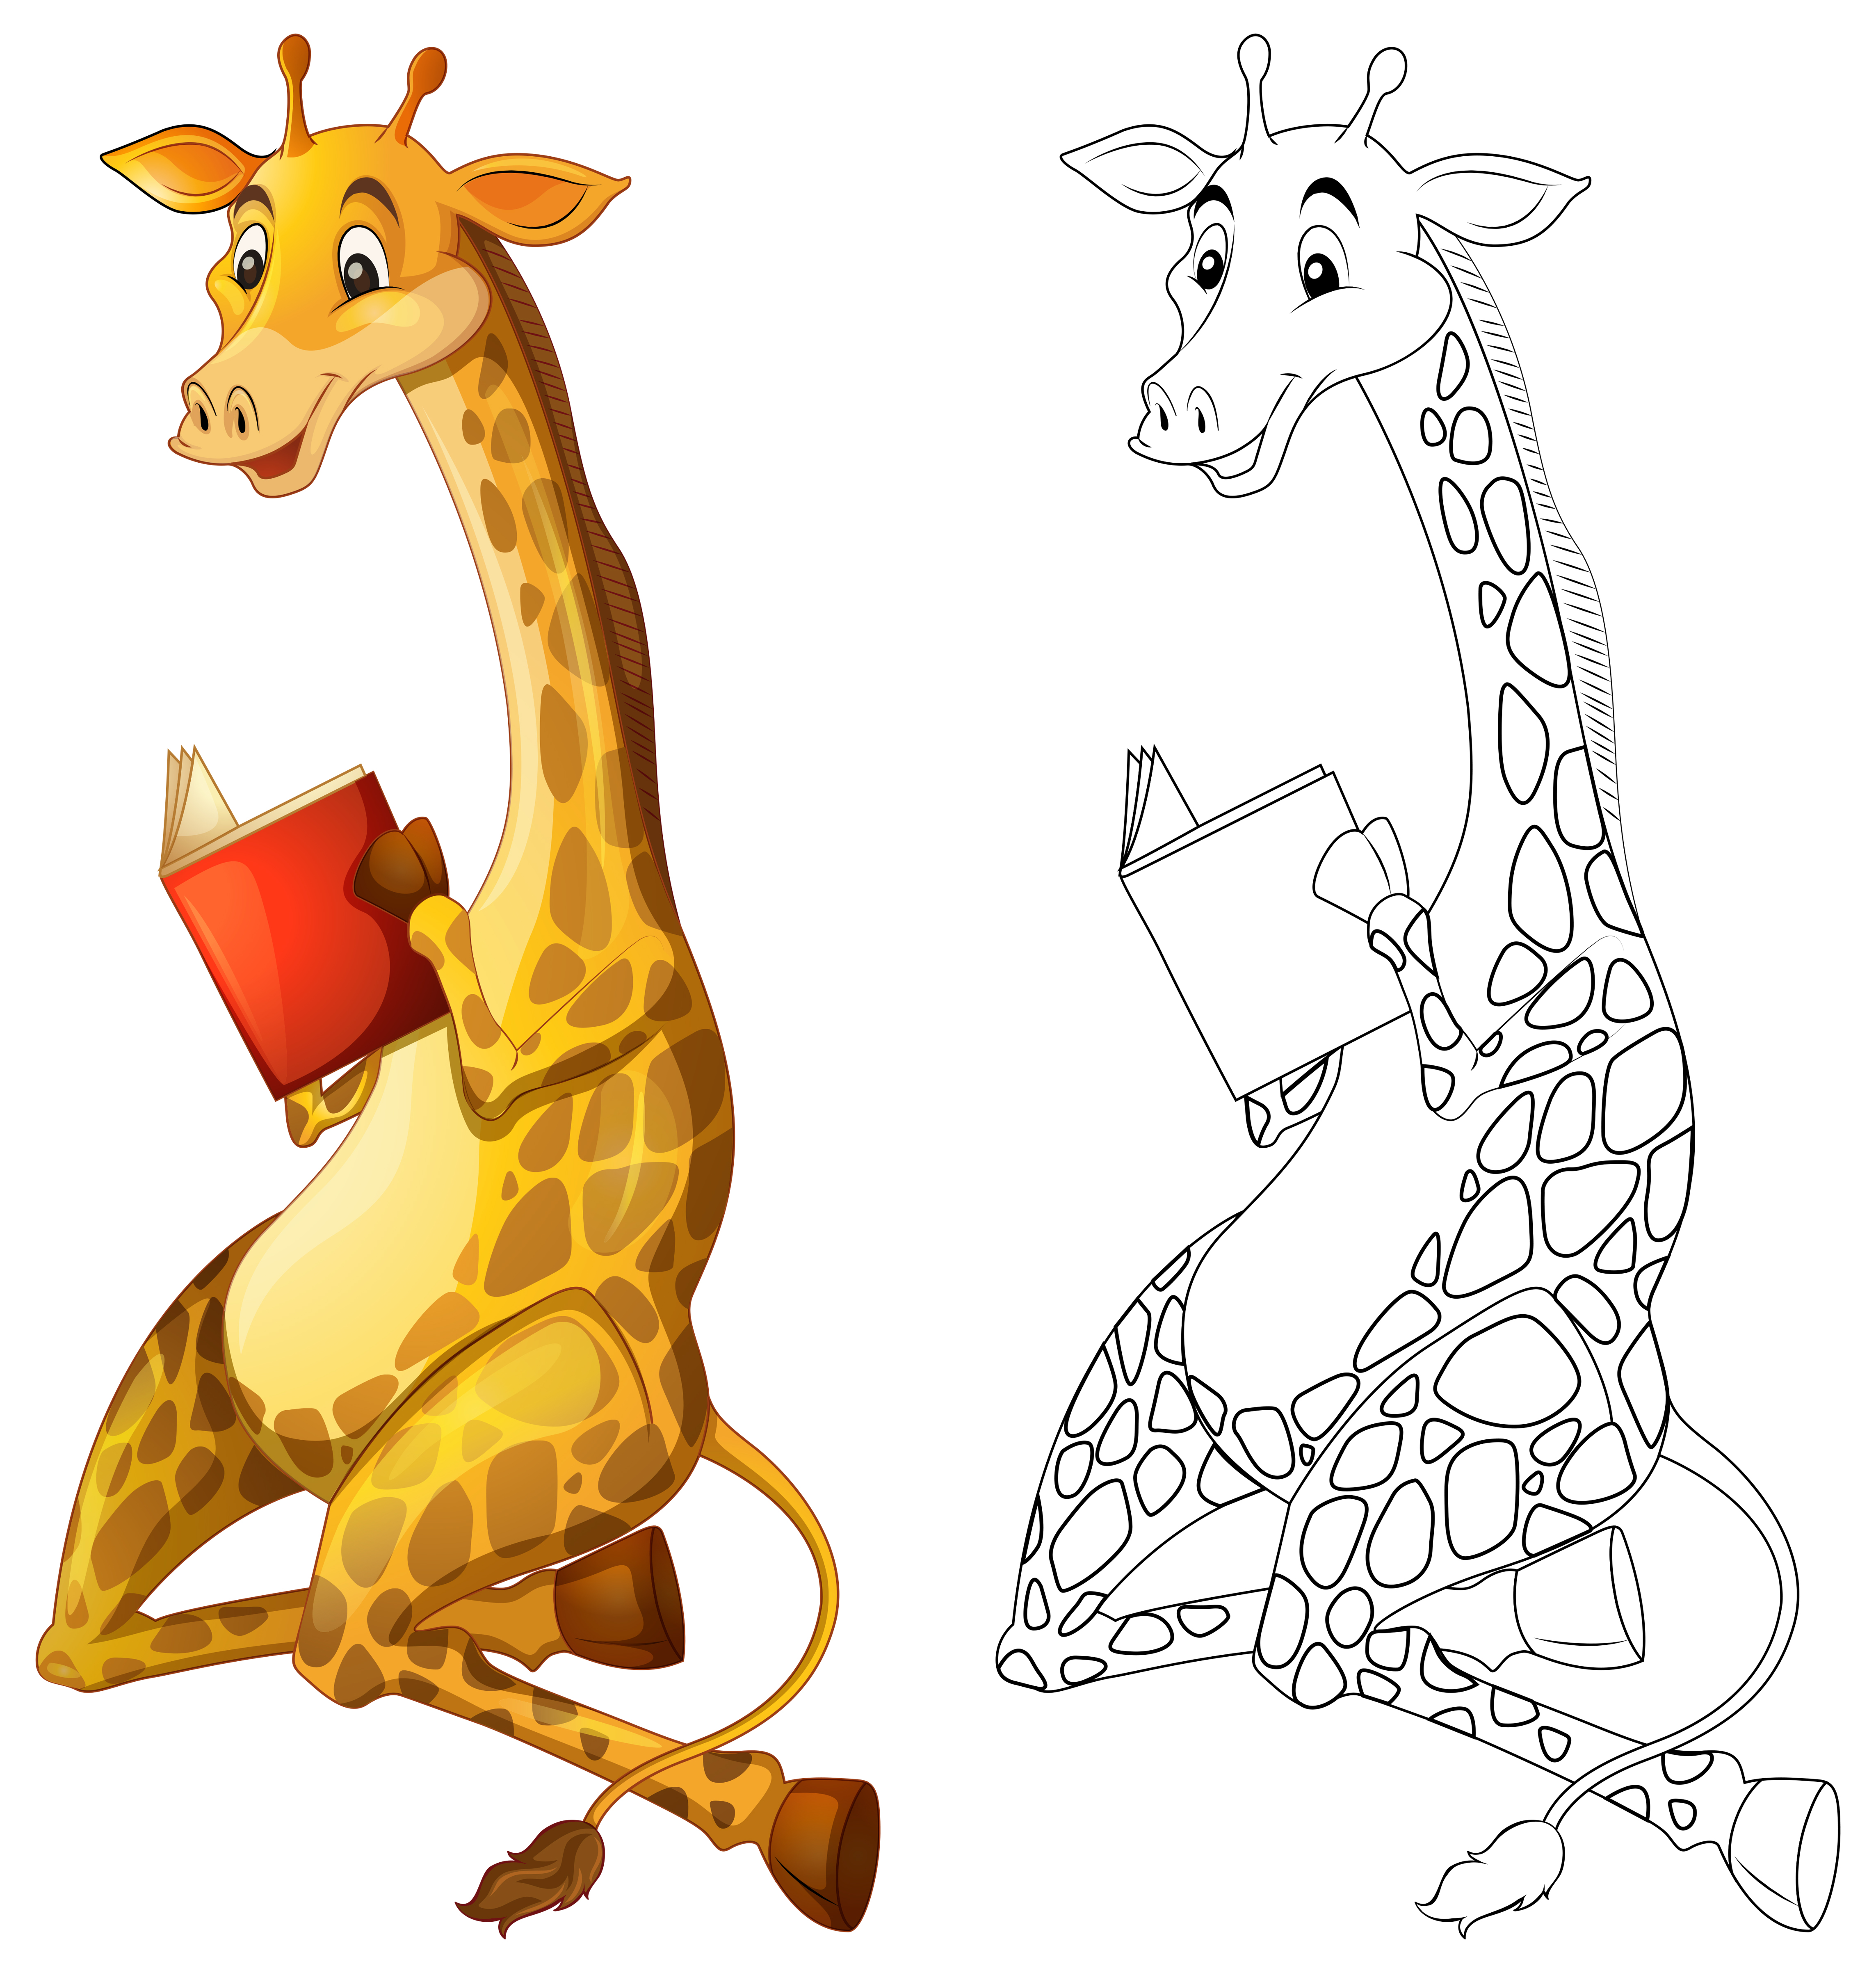 Doodles drafting animal for giraffe reading book ...